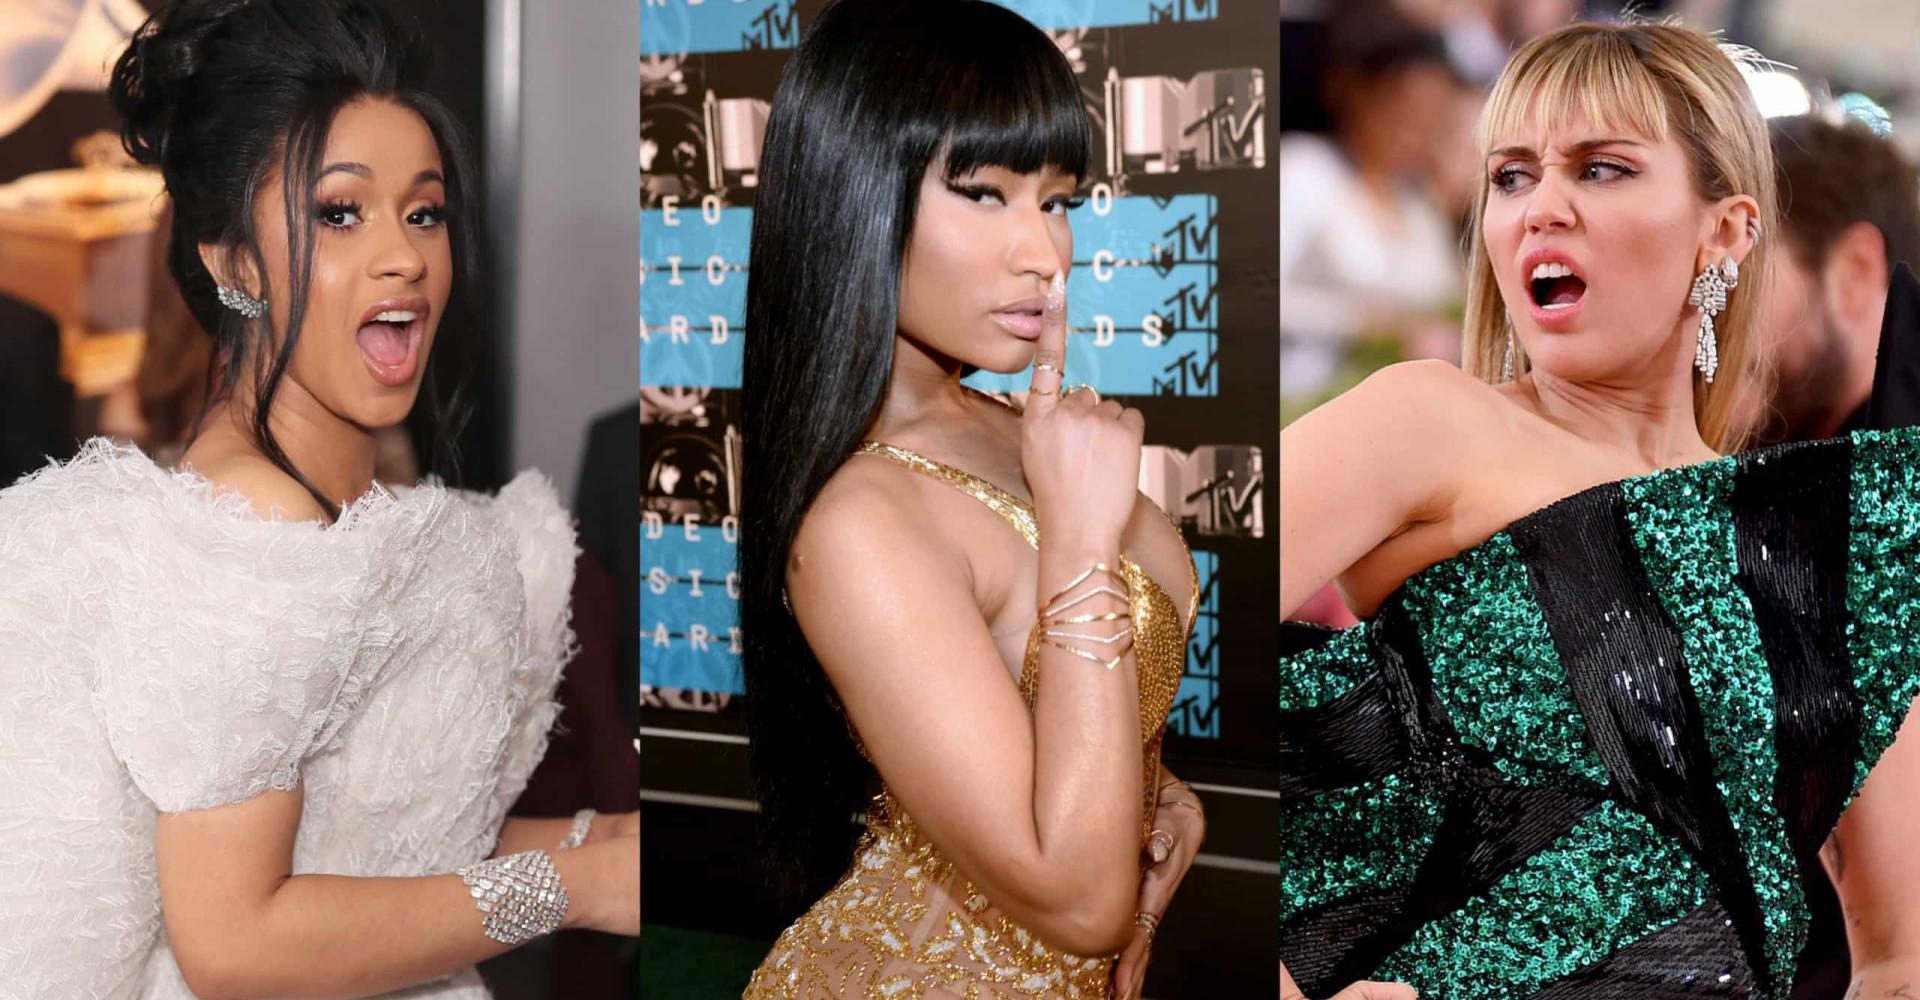 Everyone Nicki Minaj has ever called out in public